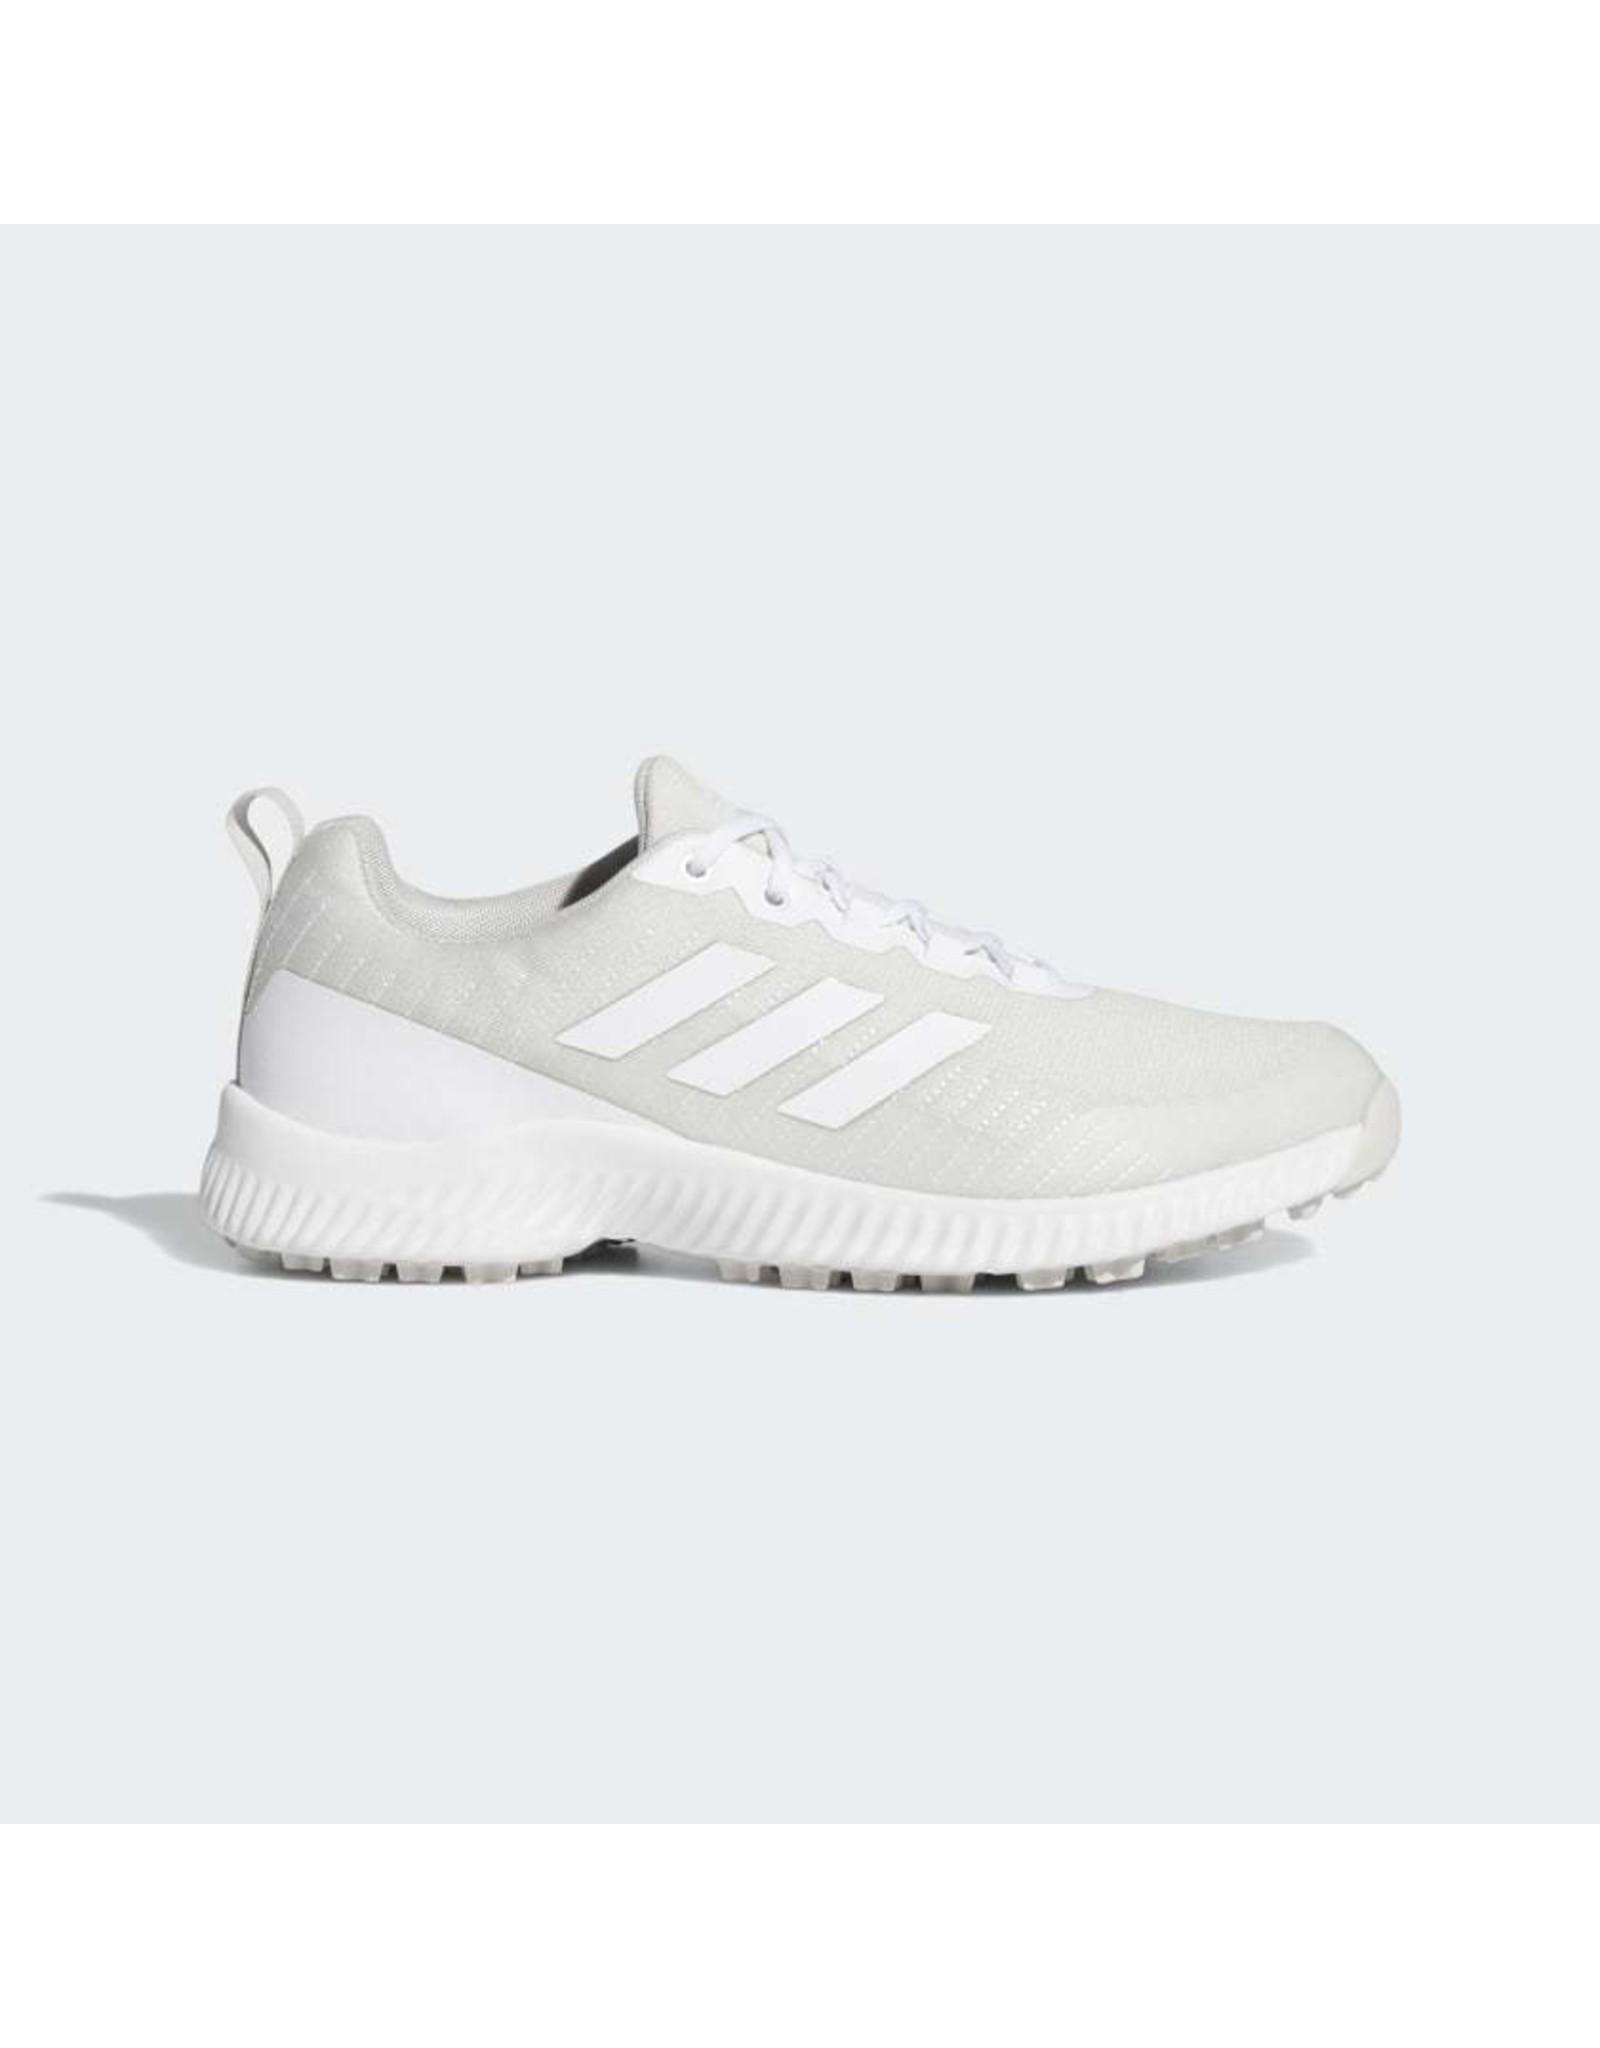 Adidas Adidas Women's Response Bounce 2.0 SL White